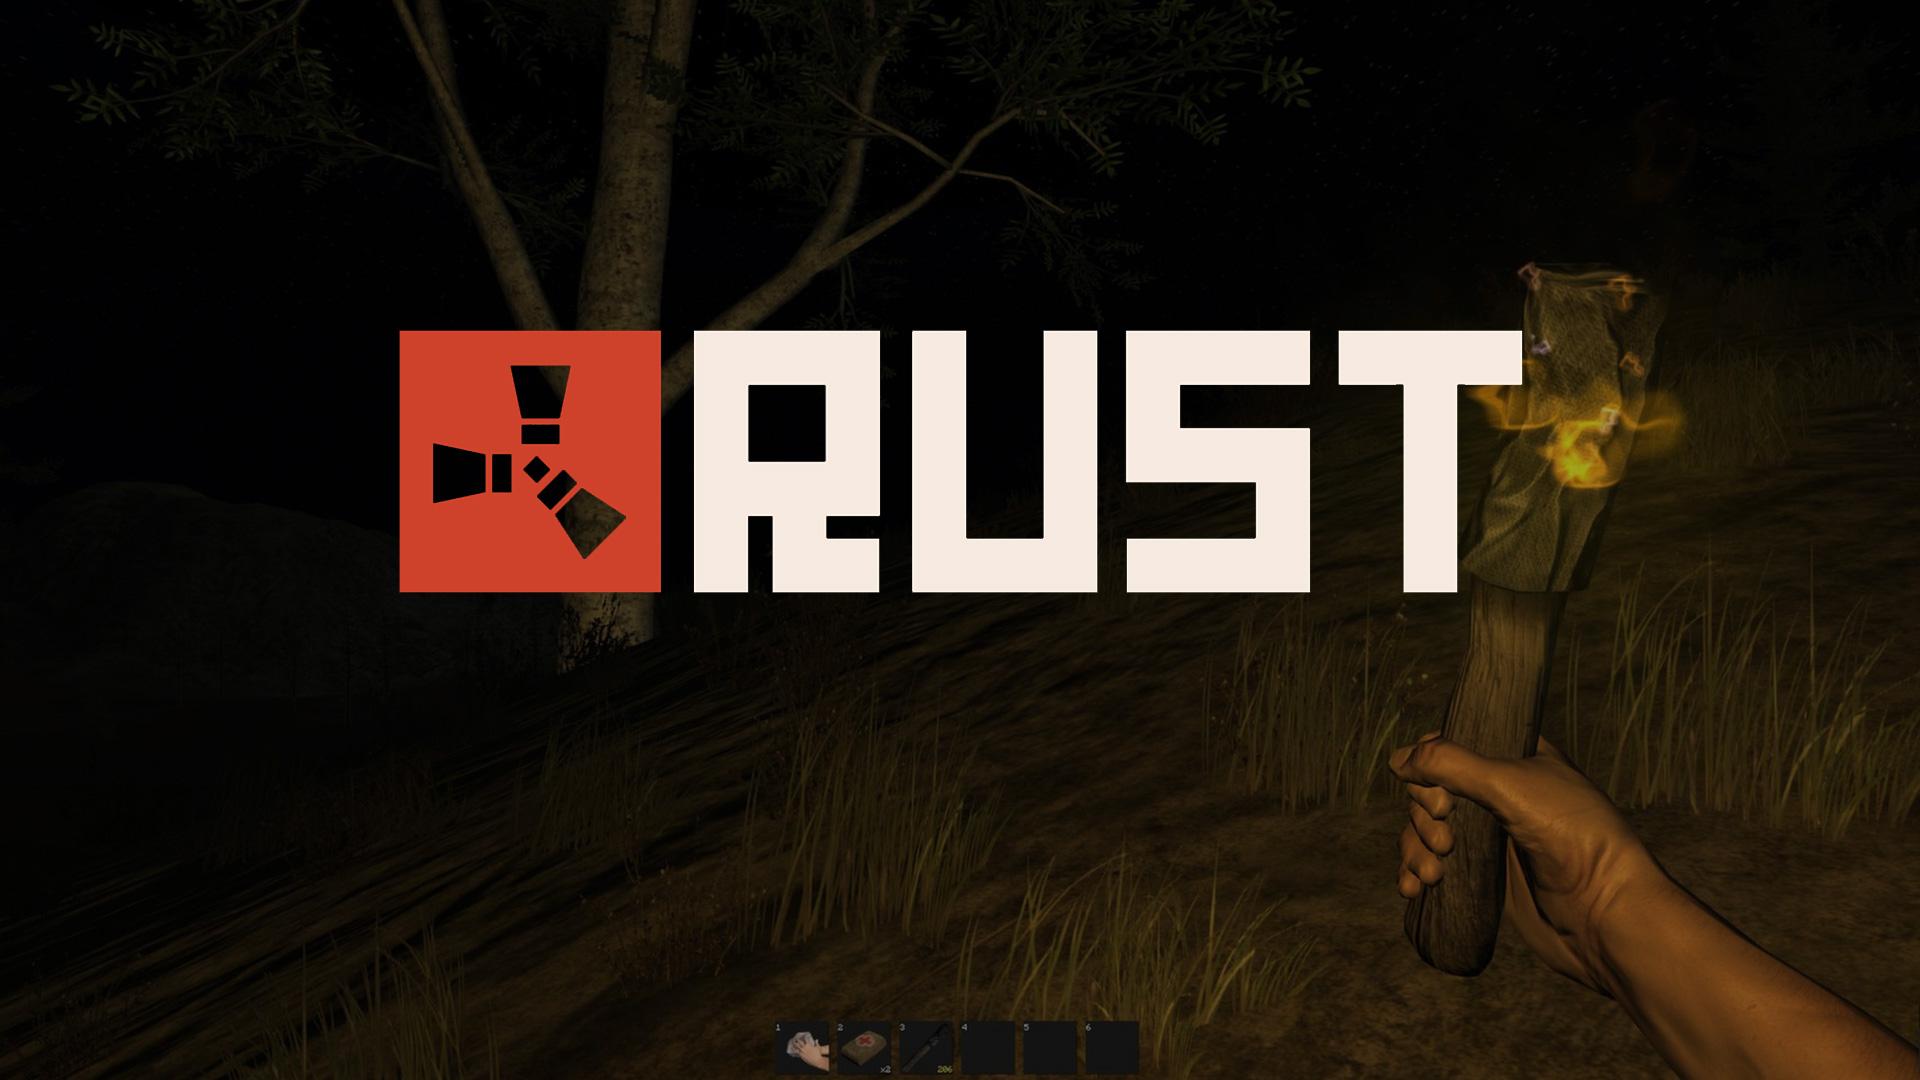 Rust wallpaper 3